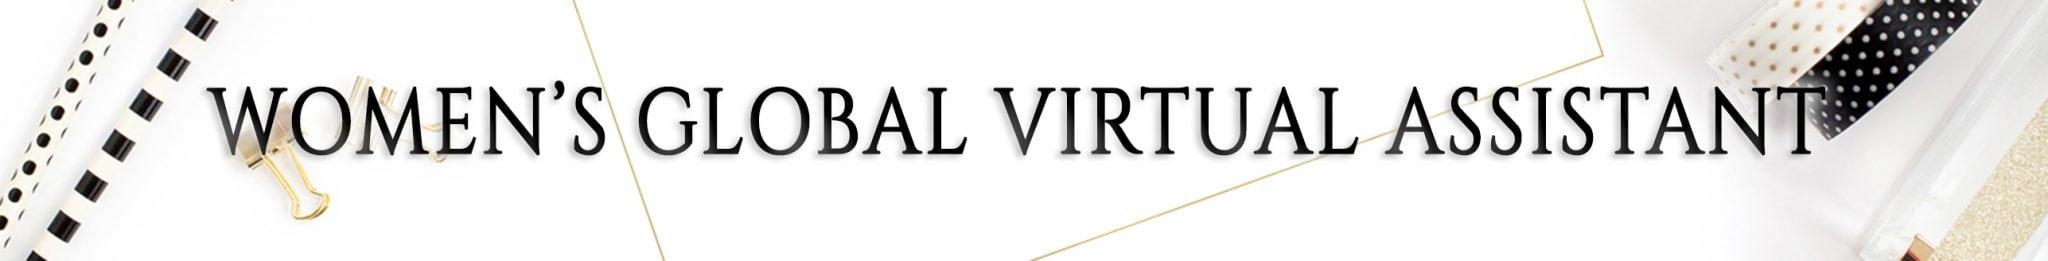 Women's Global Virtual Assistant